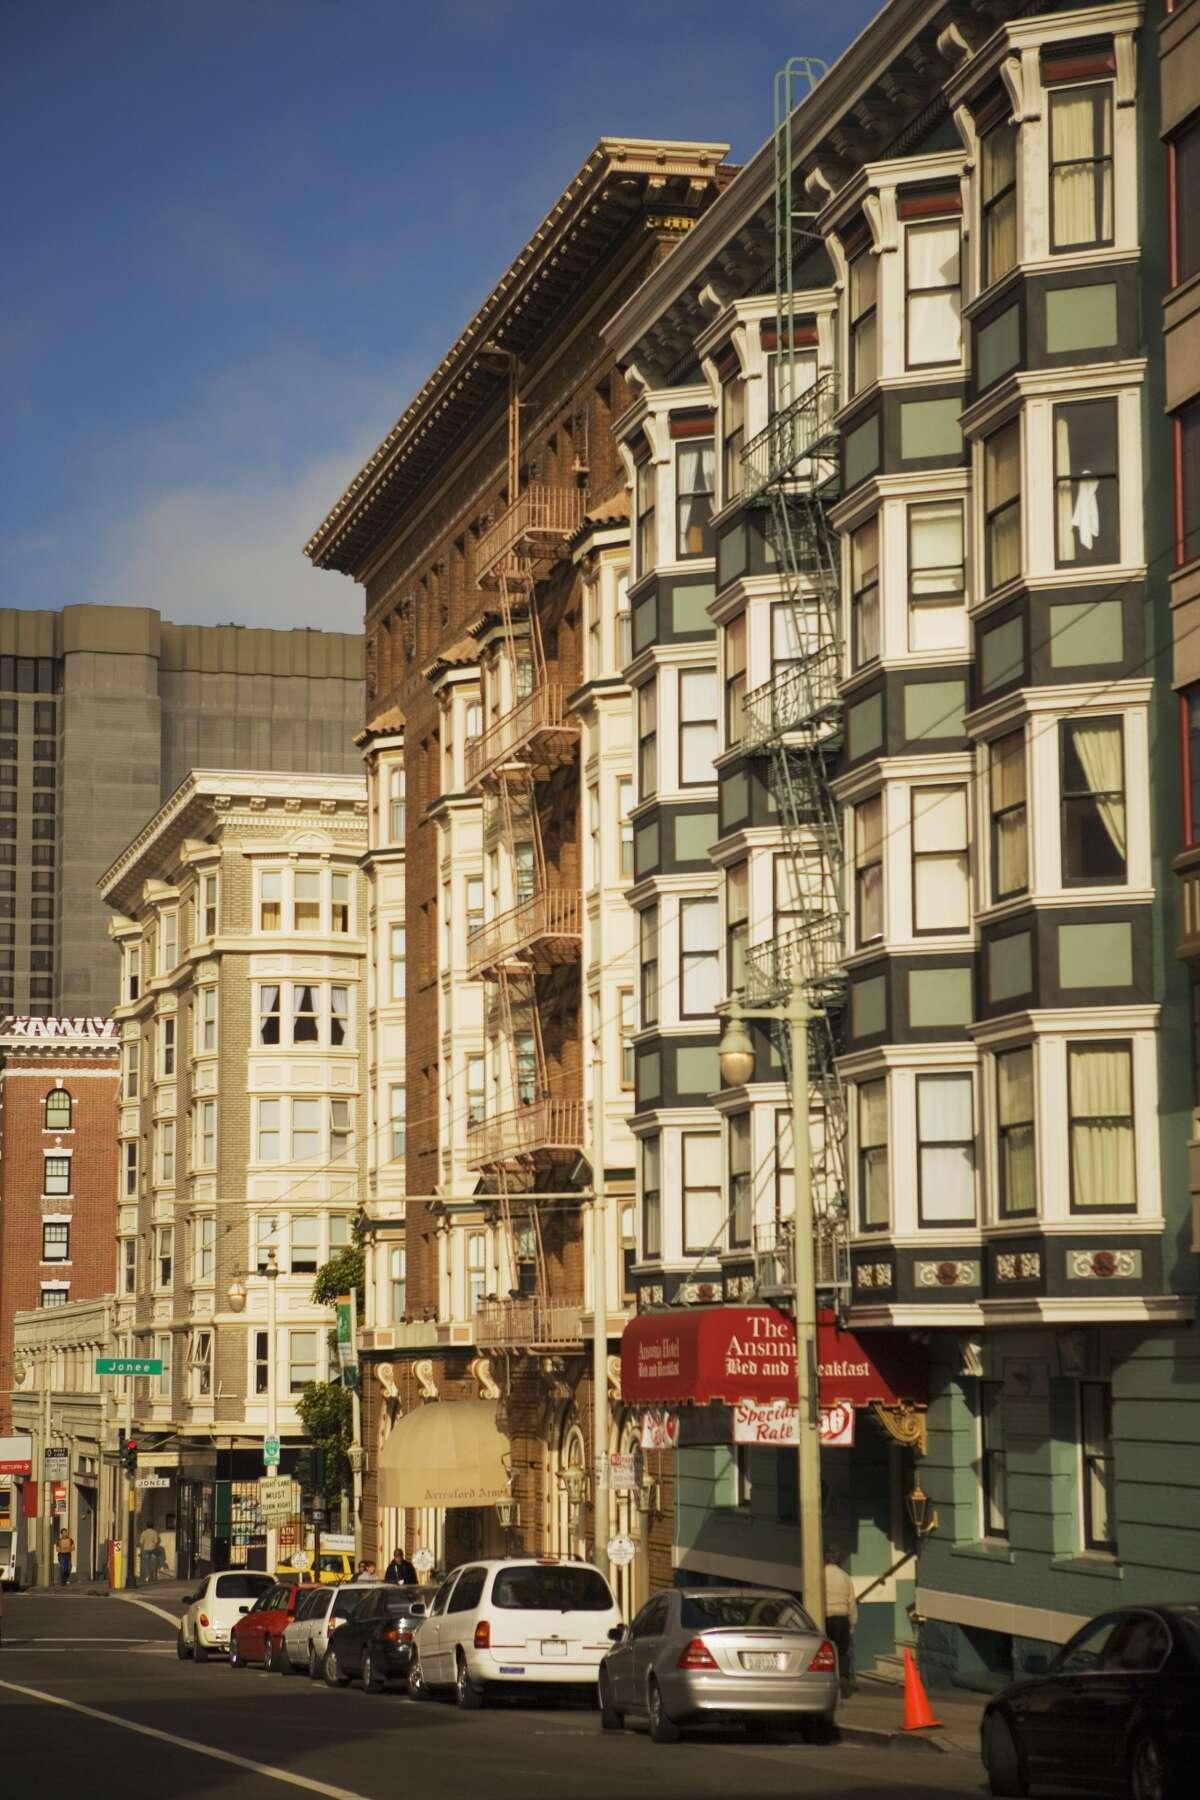 15 euphemisms you'll find in SF Craigslist housing posts